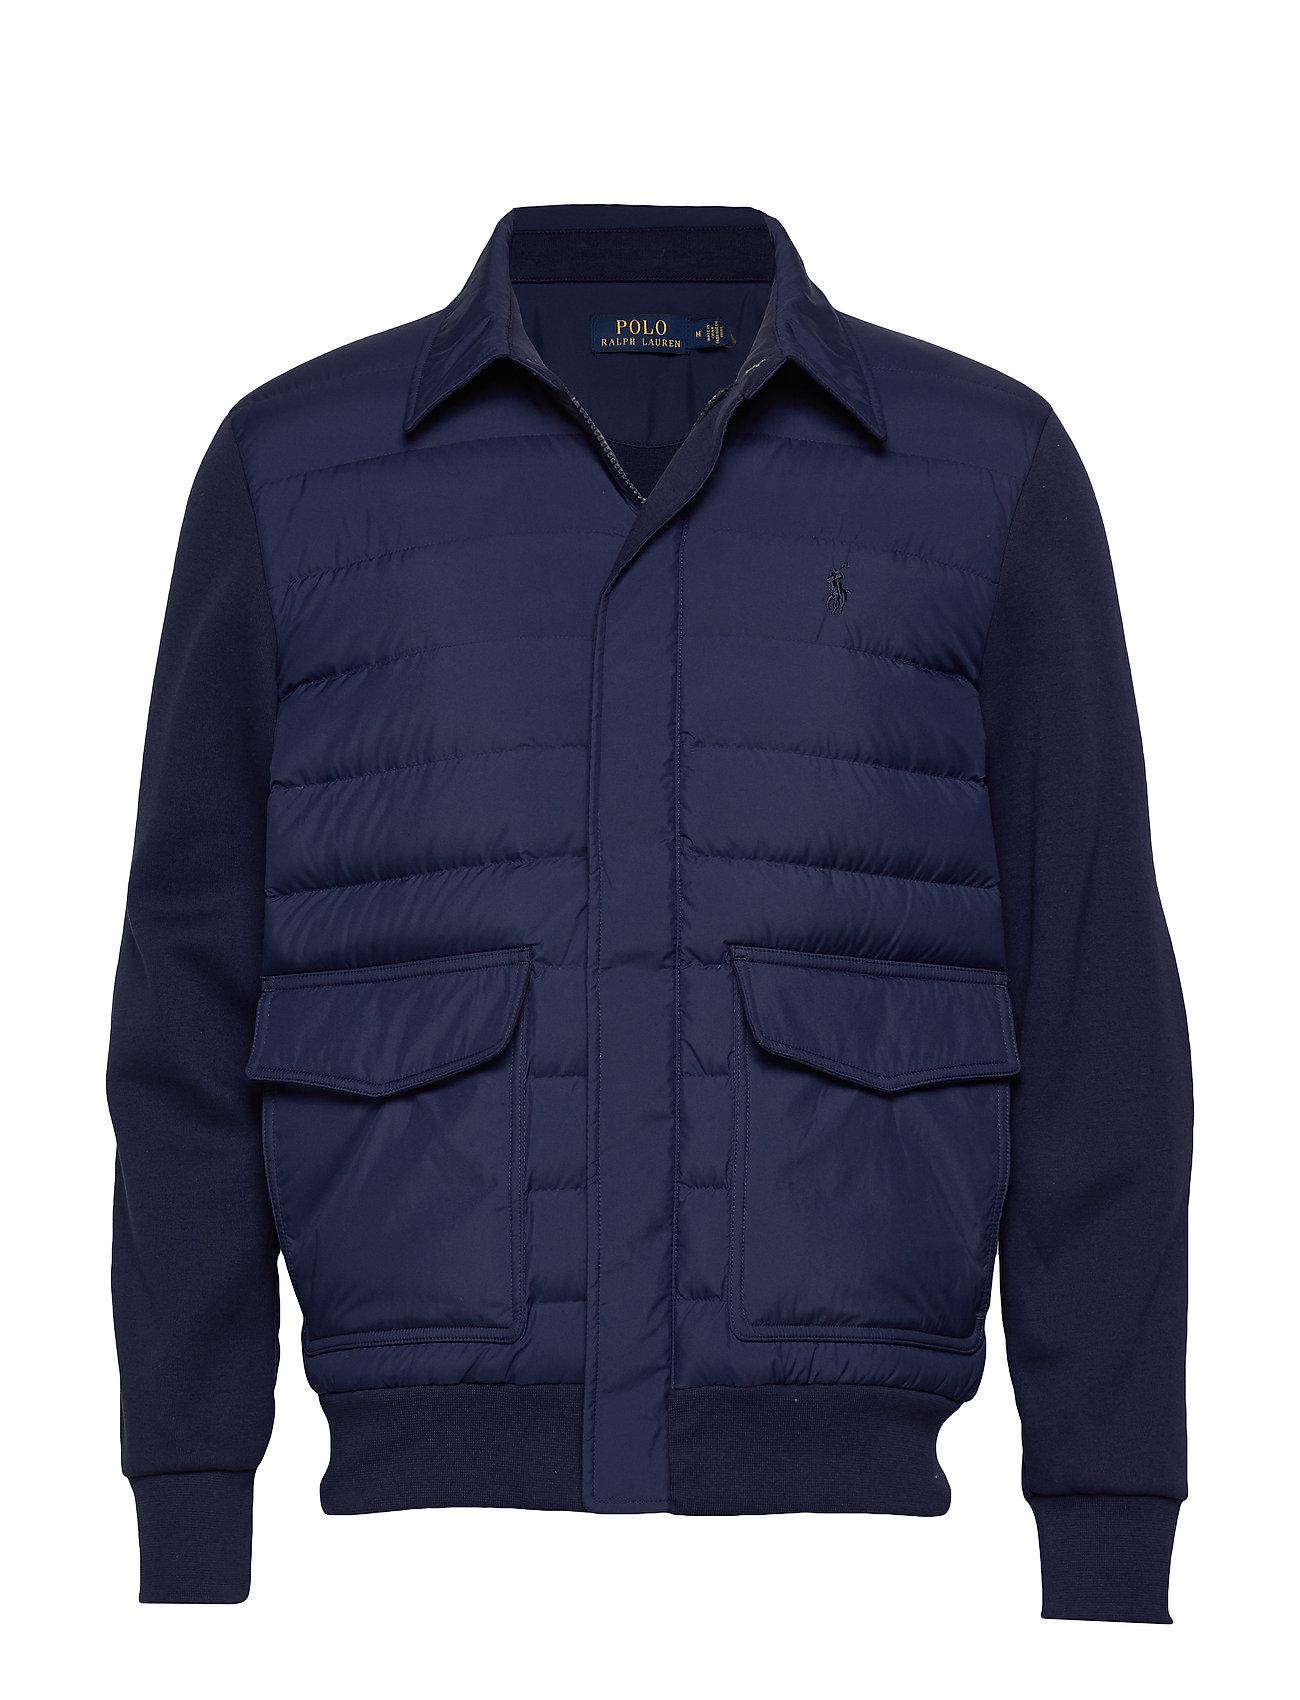 Polo Ralph Lauren Hybrid Down Bomber Jacket - NEWPORT NAVY